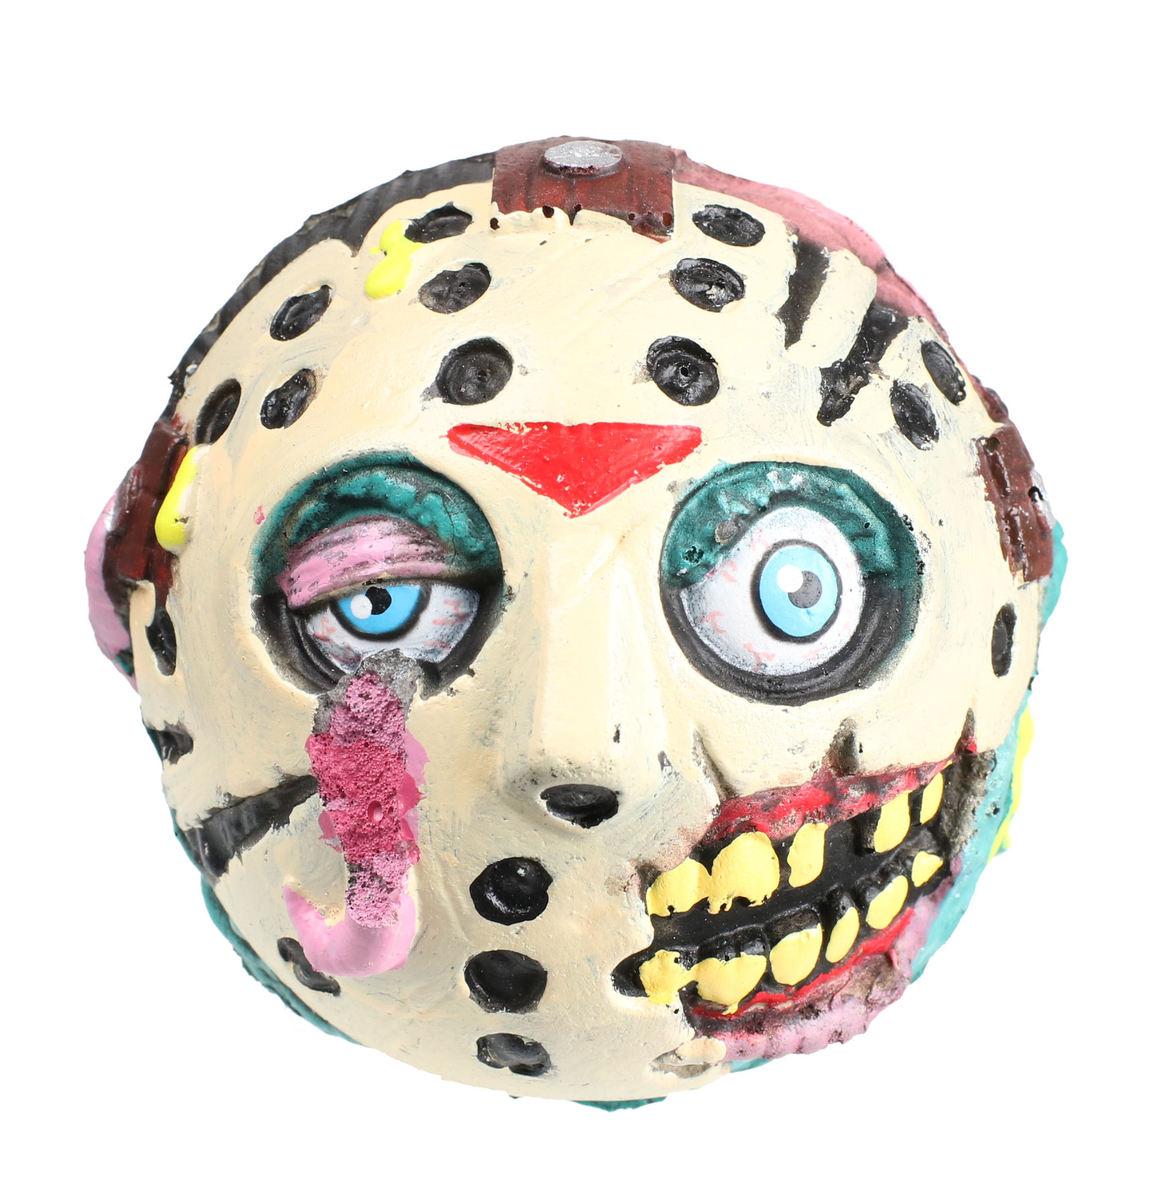 loptička Friday the 13th (piatok trinásteho) Madballs Stress - Jason Voorhees - KIROTBLCG204